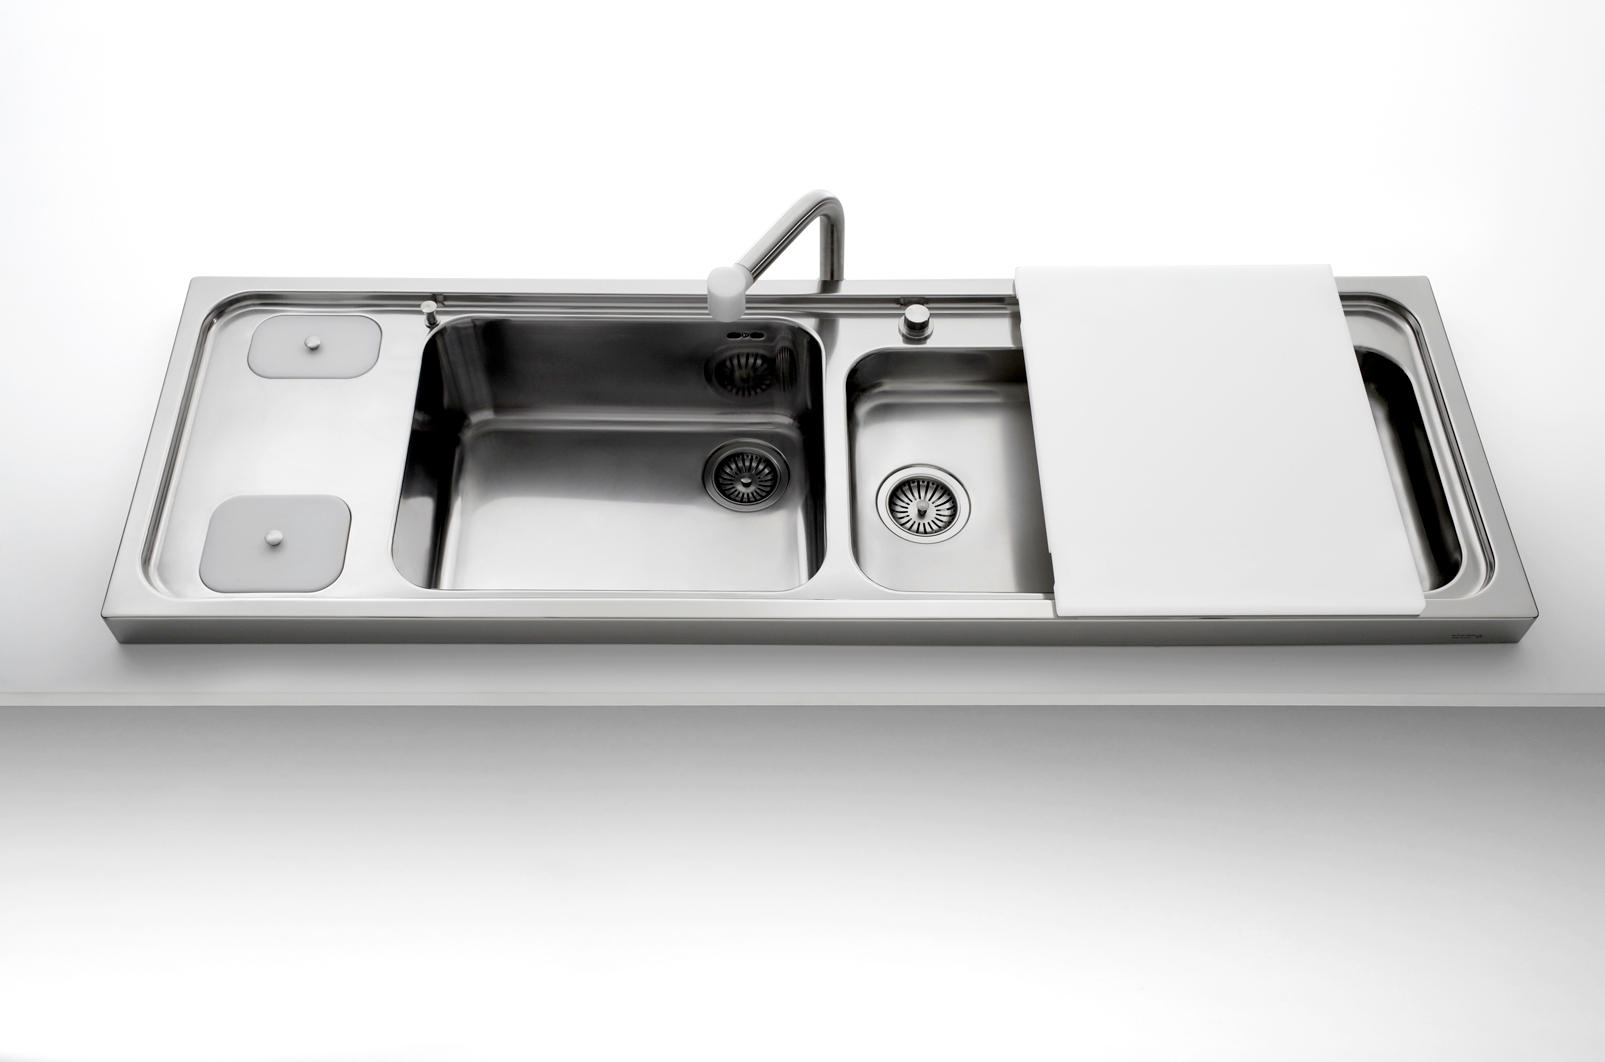 Sinks - Kitchen organization by ALPES-INOX Architonic